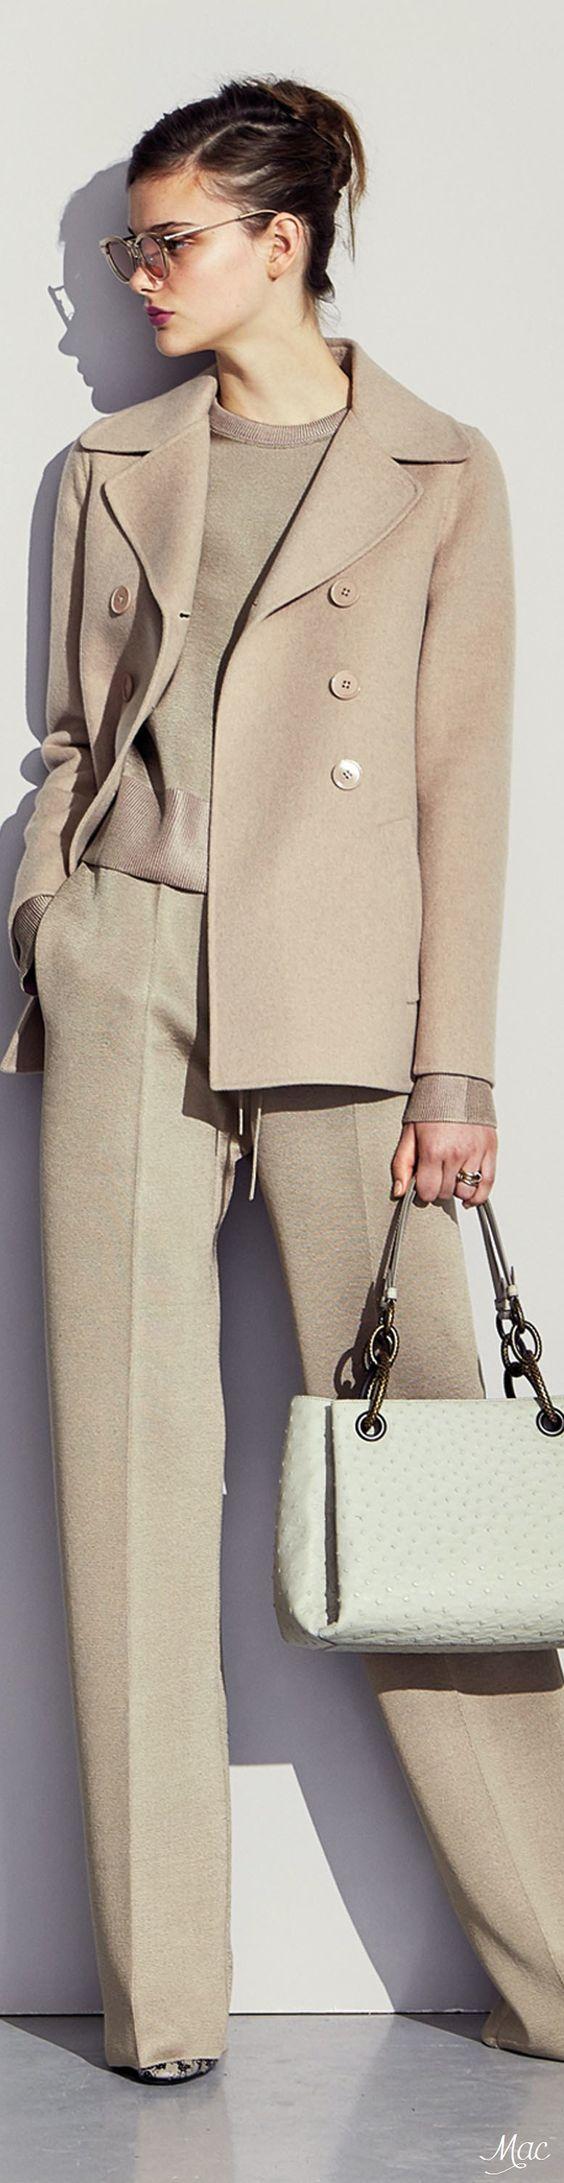 Suits for women damski garnitur